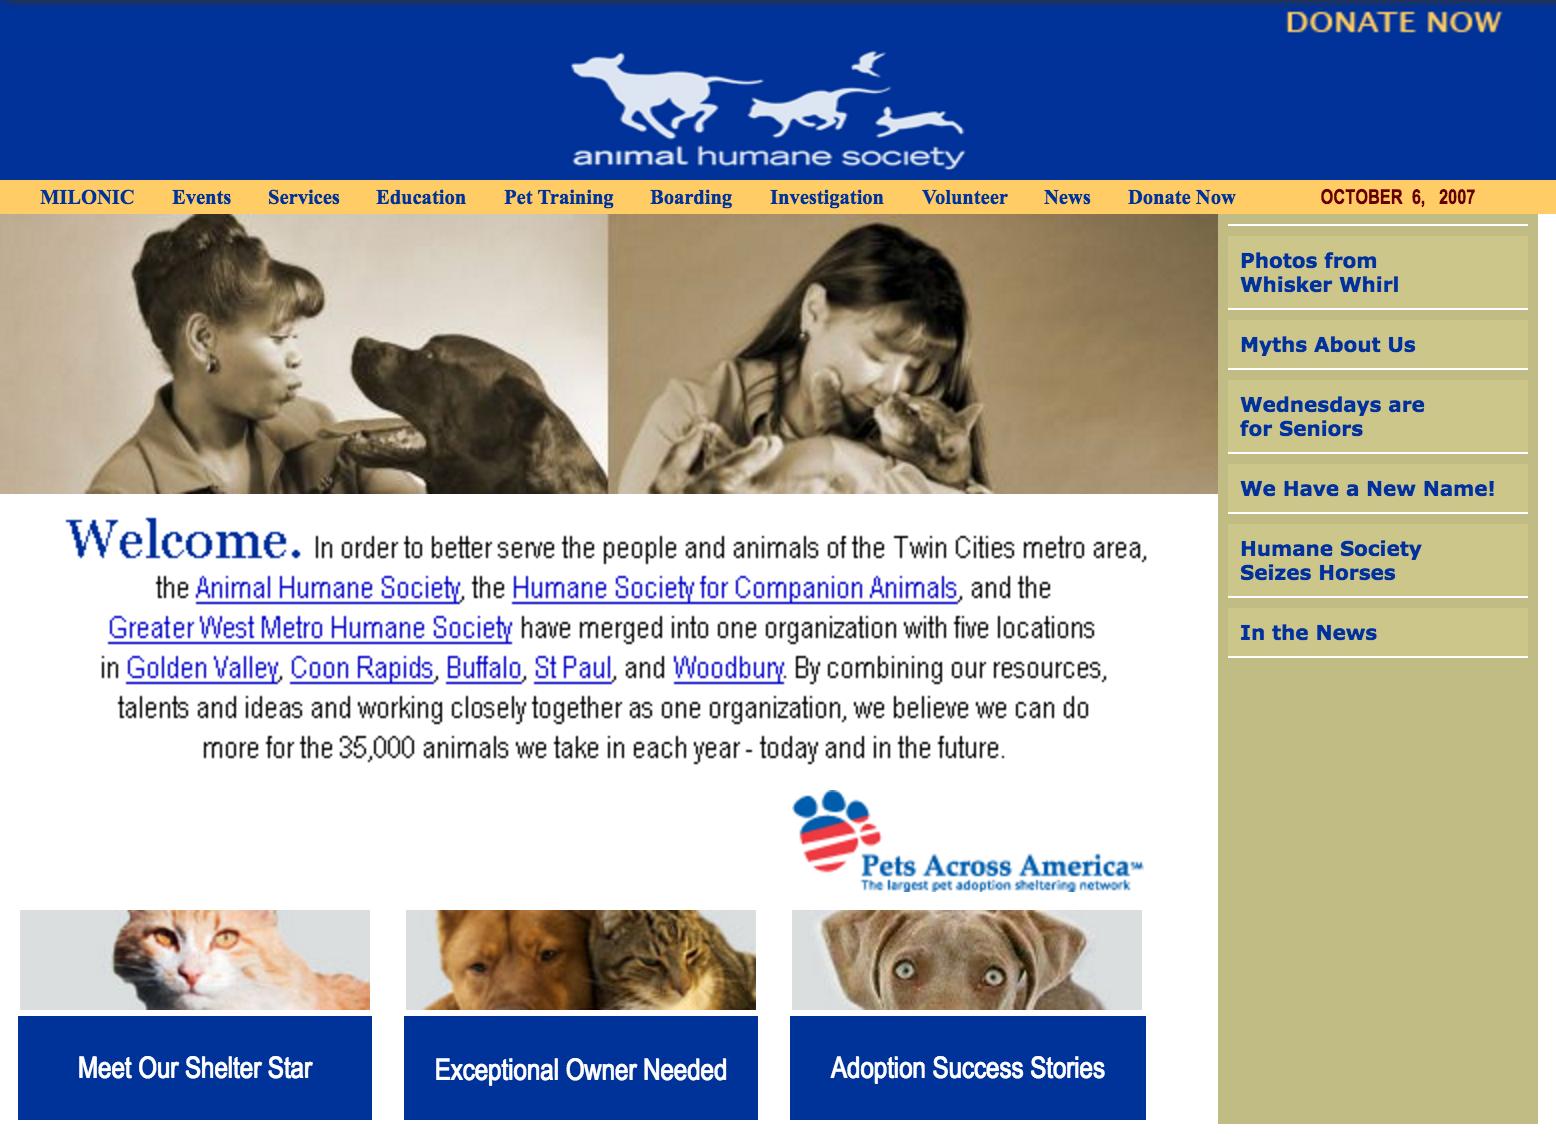 animalhumanesociety.org circa 2007